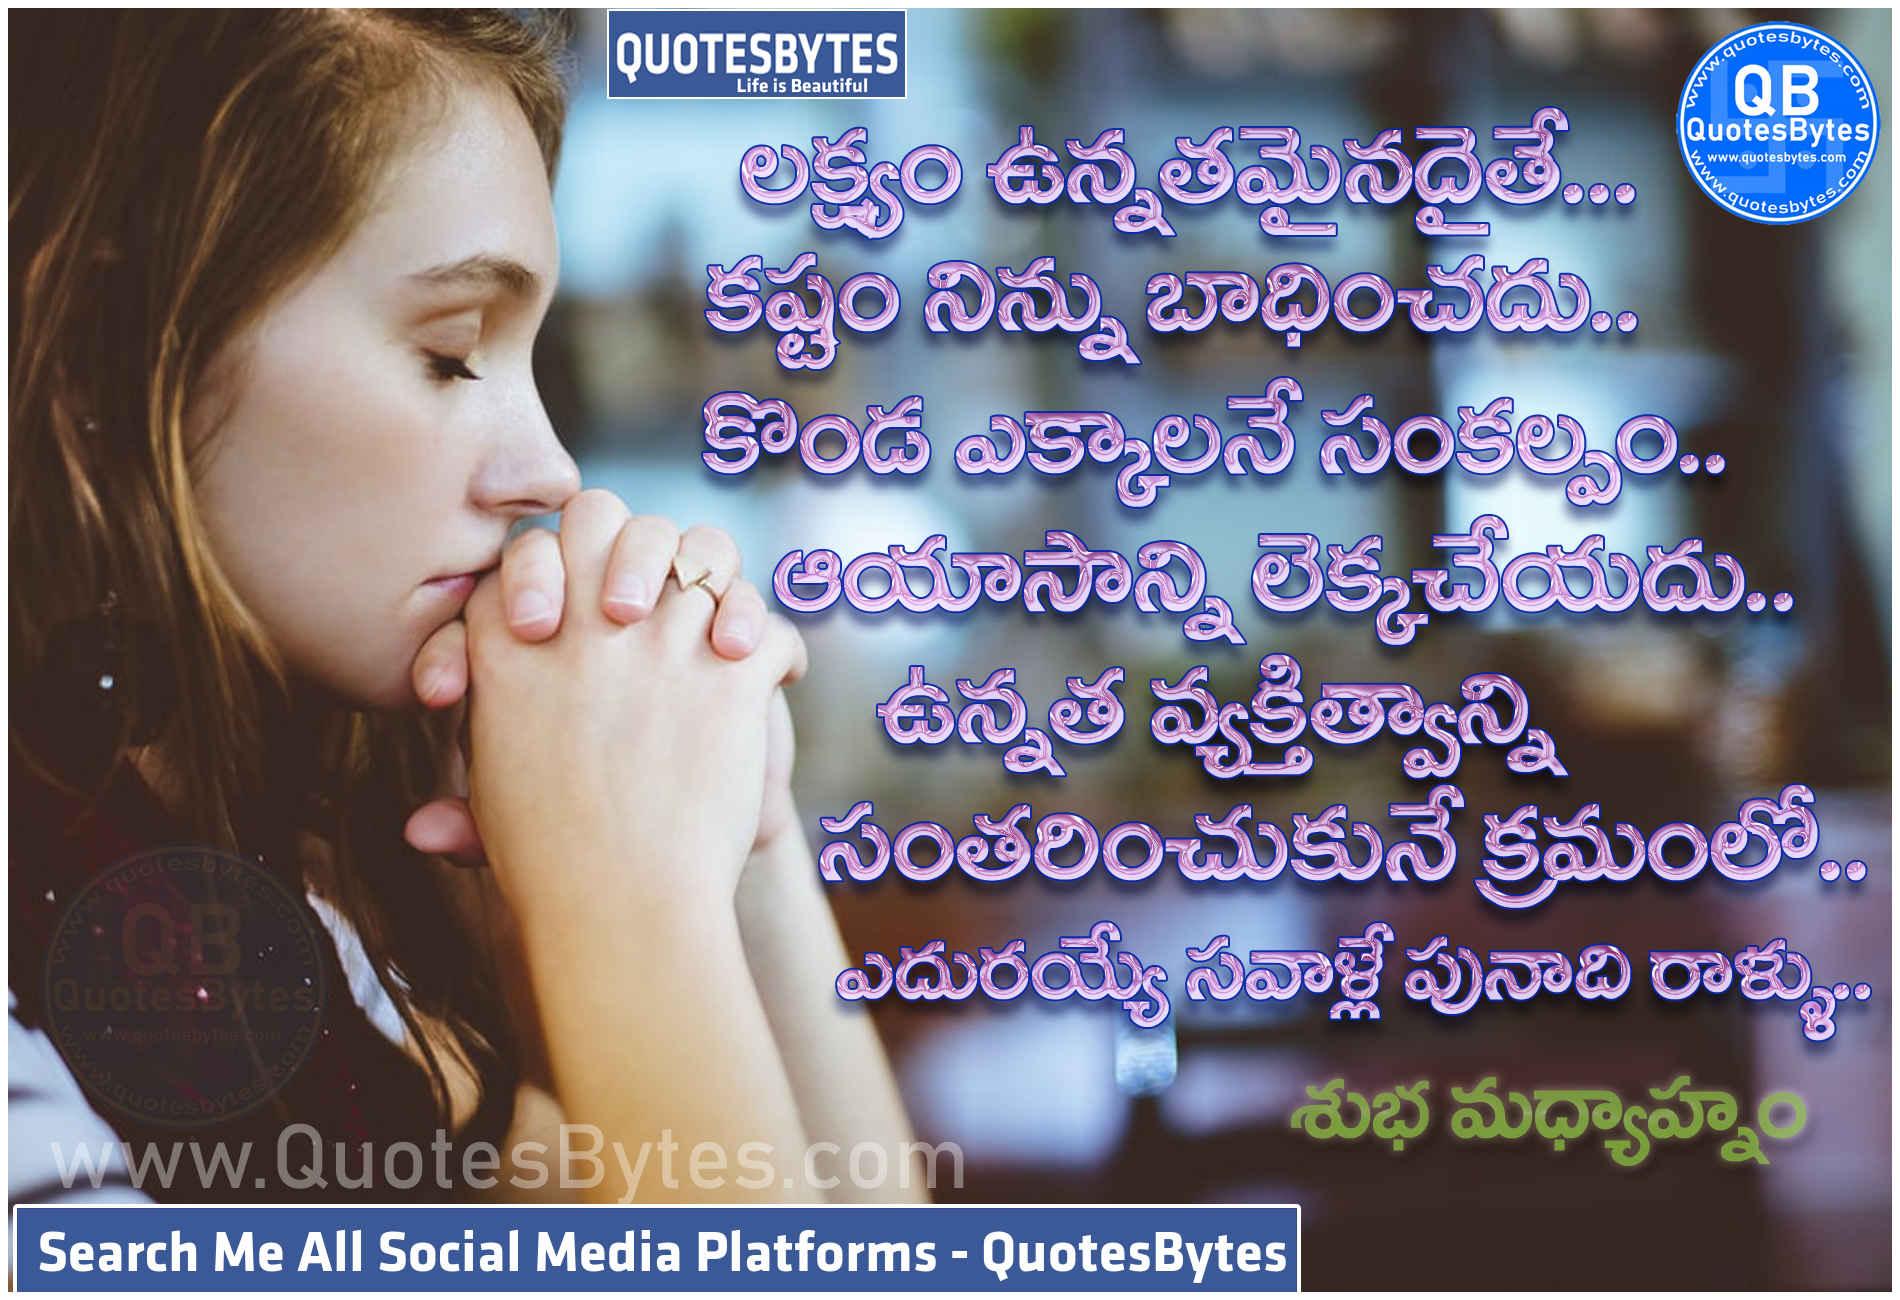 Telugu Good Afternoon Inspirational Quotes- Telugu Messages-Telugu Good Afternoon motivational quotes Good Afternoon Quotes in Telugu BEST GOOD AFTERNOON QUOTES IN TELUGU – POPULAR TELUGU QUOTES Here are good Afternoon quotes in Telugu text,Telugu good Afternoon kavithalu,good Afternoon quotes to share with friends,Best Telugu Good Afternoon whatsapp dp,good Afternoon quotes in Telugu for lovers, good Afternoon in the Telugu language, best good Afternoon whatsapp dp,Inspirational Good Afternoon Quotes in Telugu, download good Afternoon quotes Telugu. good Afternoon quotes in telugu, good Afternoon quotes in Telugu, Telugu good Afternoon images, and also good Afternoon images in Telugu,status quotes in telugu greetings and wishes,status Quotes,Telugu good Afternoon quotes, good Afternoon wishes in Telugu, good Afternoon messages in Telugu ,Telugu good Afternoon SMS and status ,good Afternoon quotes, wishes in telugu,Best Telugu Quotes and Good Afternoon Quotes,TELUGU QUOTES GOOD AFTERNOON QUOTES, Afternoon wishes, great Afternoon wishes.good Afternoon quotes, wishes in telugu, Best good Afternoon pics, quotes,Telugu Good Afternoon Quotes for Facebook whatsapp dp,status,Facebook good Afternoon Quotes with Images,images and sayings,telugu good afternoon quotes, NEW HD wallpapers best images, Good Afternoon Telugu NEW cute and awesome images and wallpapers in HD Good Afternoon Telugu, Telugu WhatsApp, Best And Top Good Afternoon In Telugu, Images, Quotes, Messages, Wishes. If you Are searching for good Afternoon quotes in Telugu, Telugu good Afternoon images, and also good Afternoon images in Telugu, Telugu good Afternoon quotes, good Afternoon wishes in Telugu, good Afternoon messages in Telugu and Telugu good Afternoon sms and status,Good Afternoon Quotes in Telugu,Telugu Good Afternoon Quotes for Whatsapp Status, Telugu Good Afternoon Messages for whatsapp dp,status,Telugu Good Afternoon Quotes for Whatsapp Status,Top Good Afternoon Quotes in Telugu,TELUGU GOOD AFTER